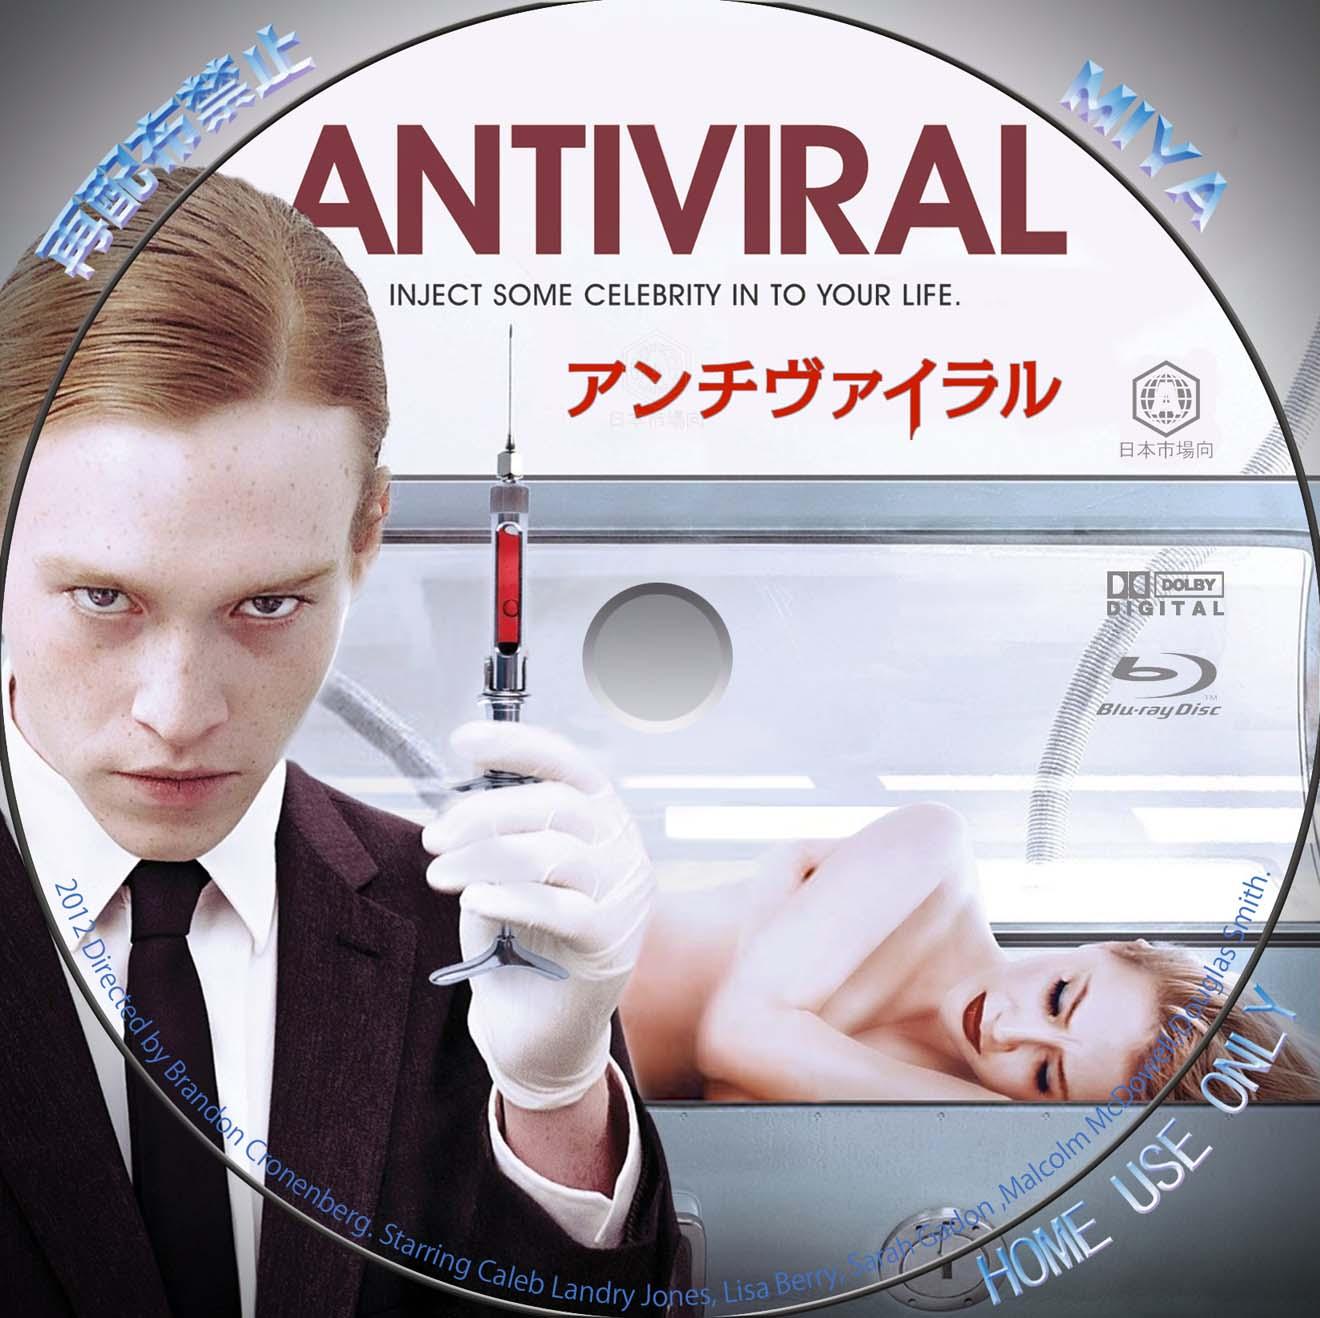 antiviralvol.2